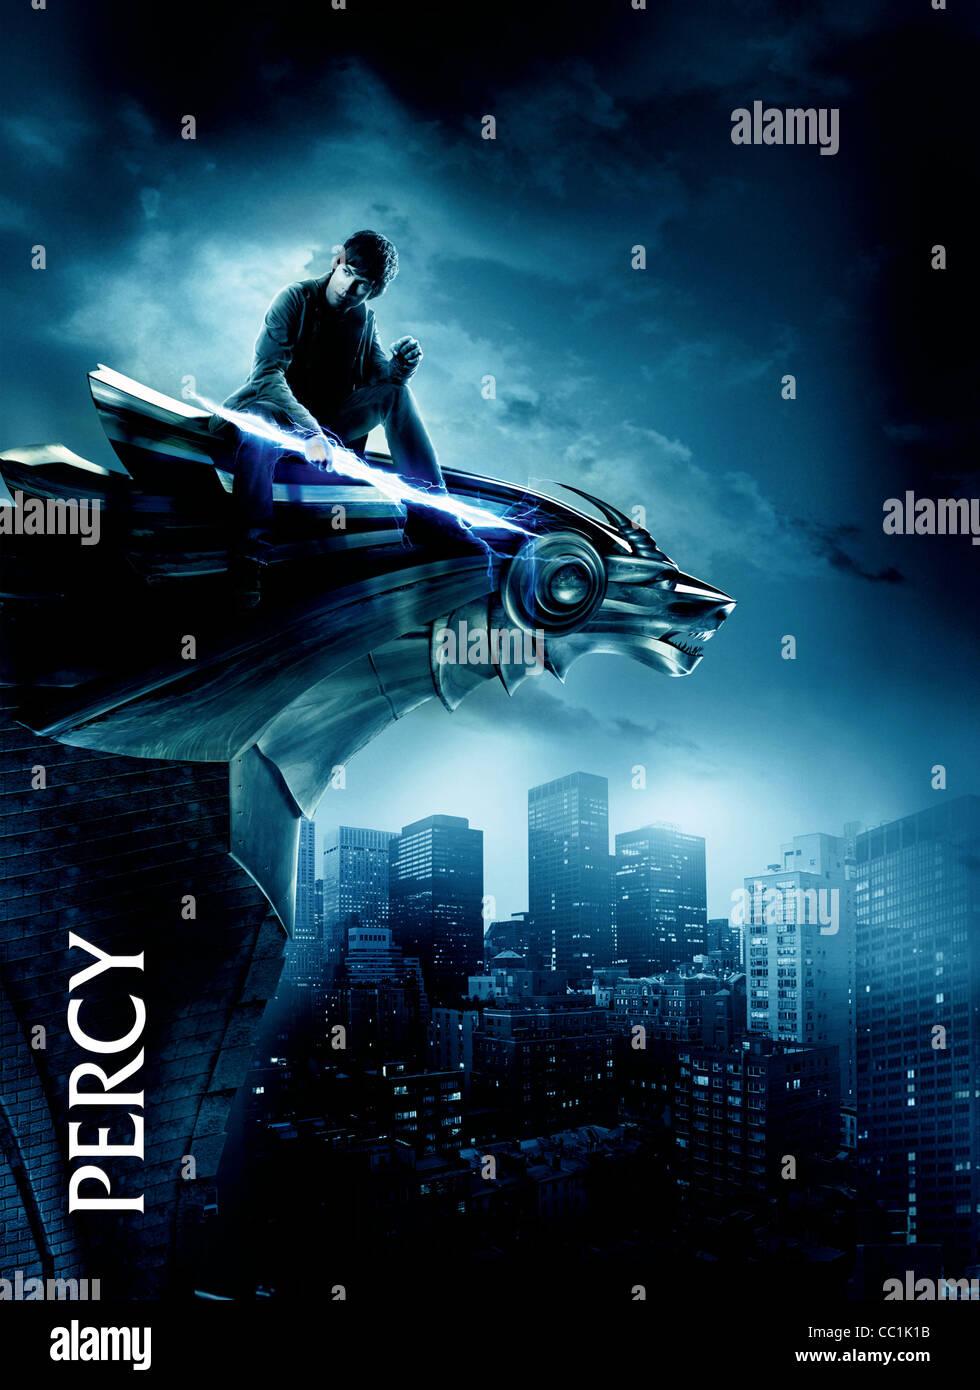 Logan Lerman Poster Percy Jackson The Olympians The Lightning Stock Photo Alamy